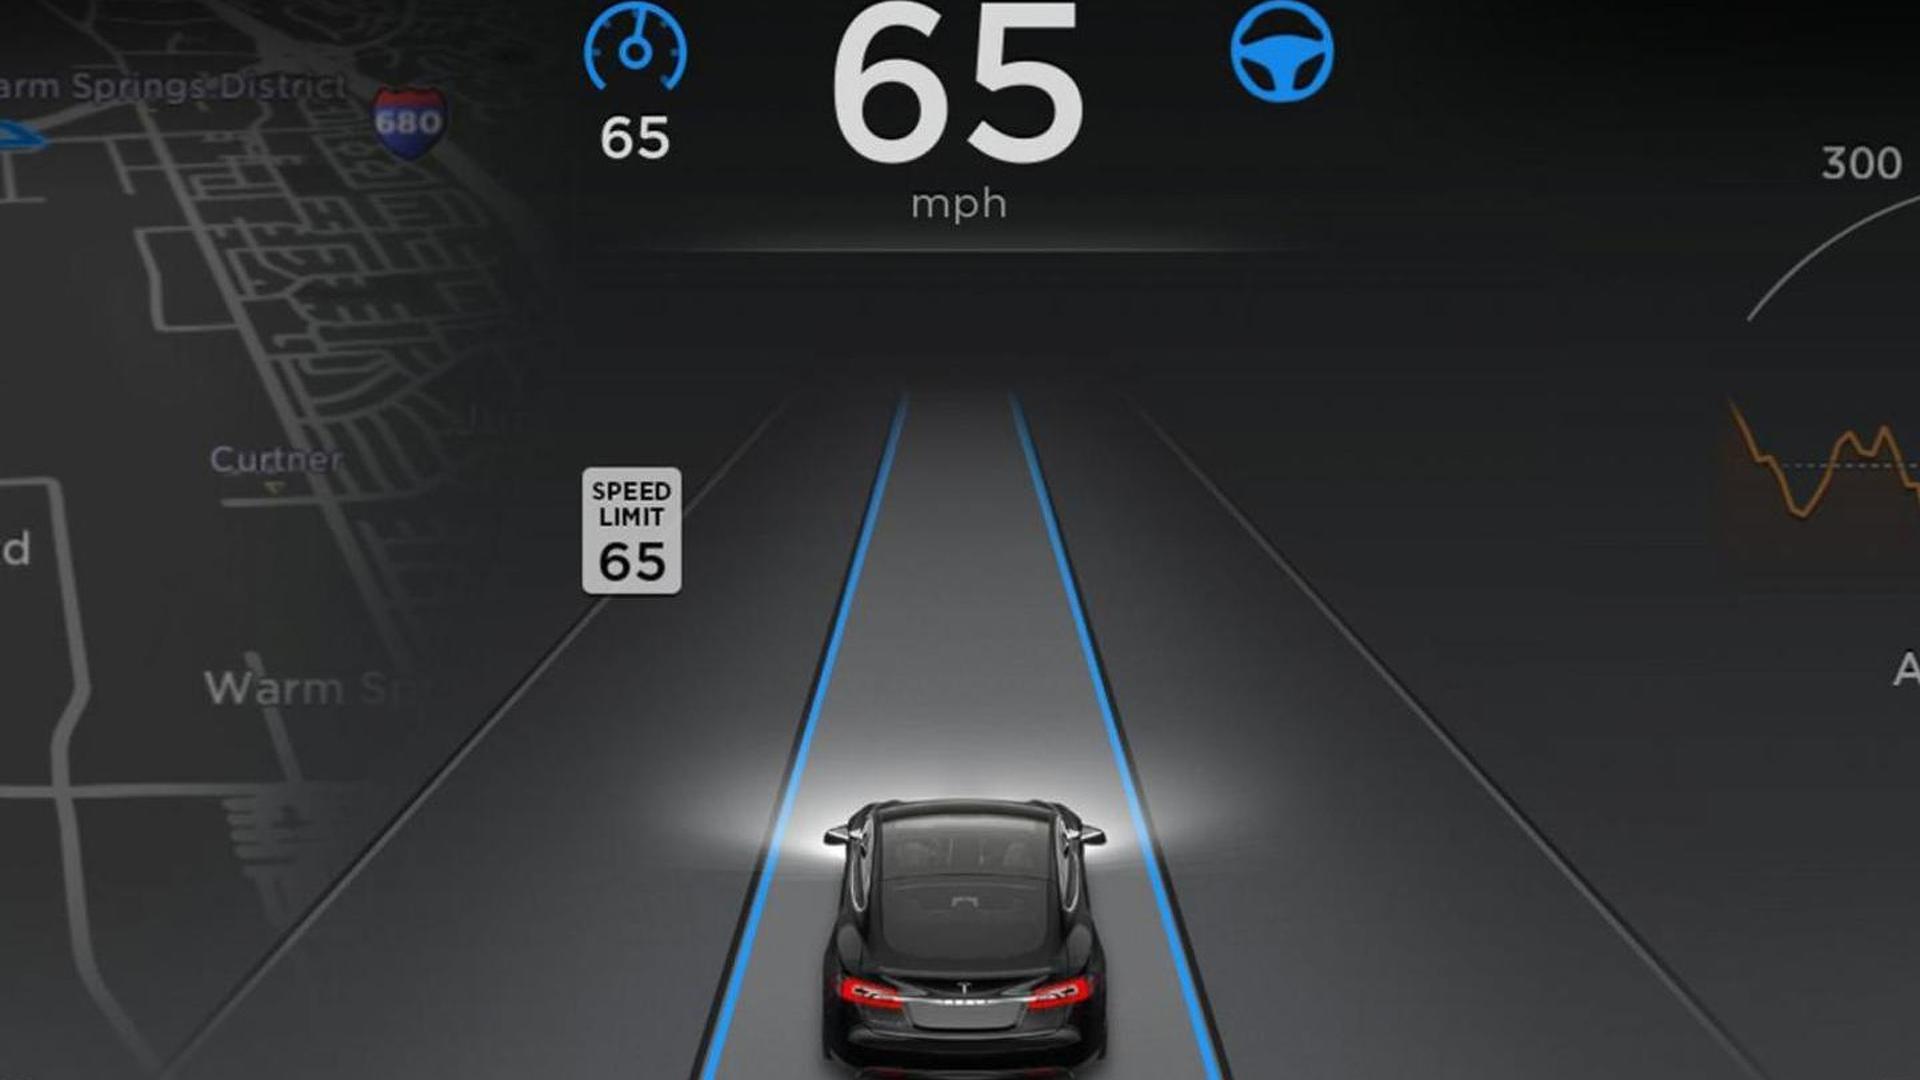 Tesla's Version 8 starts downloading tonight with Autopilot upgrades